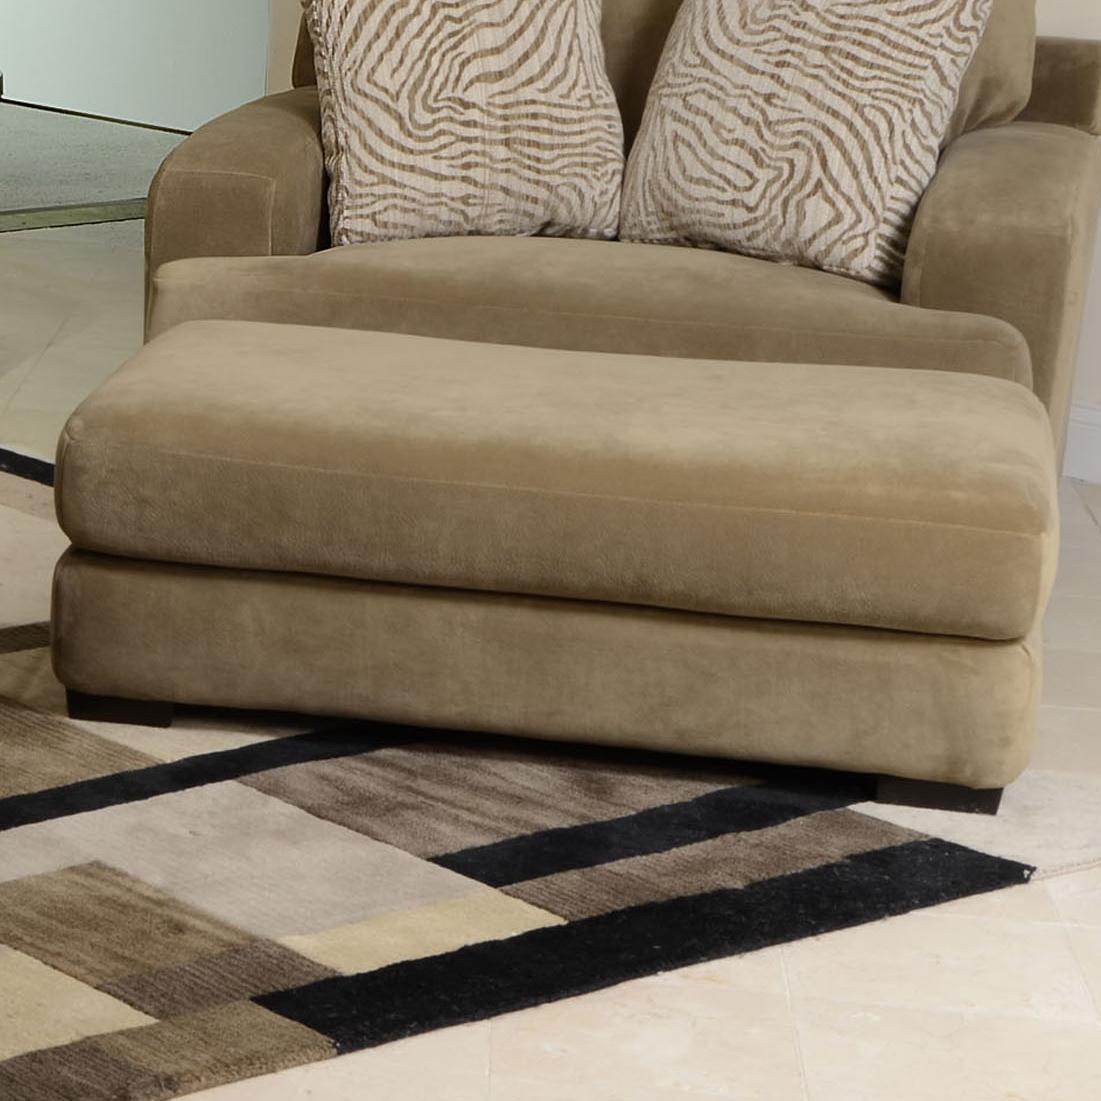 Jackson Furniture Palisades Ottoman - Item Number: 4186-10 Bronze